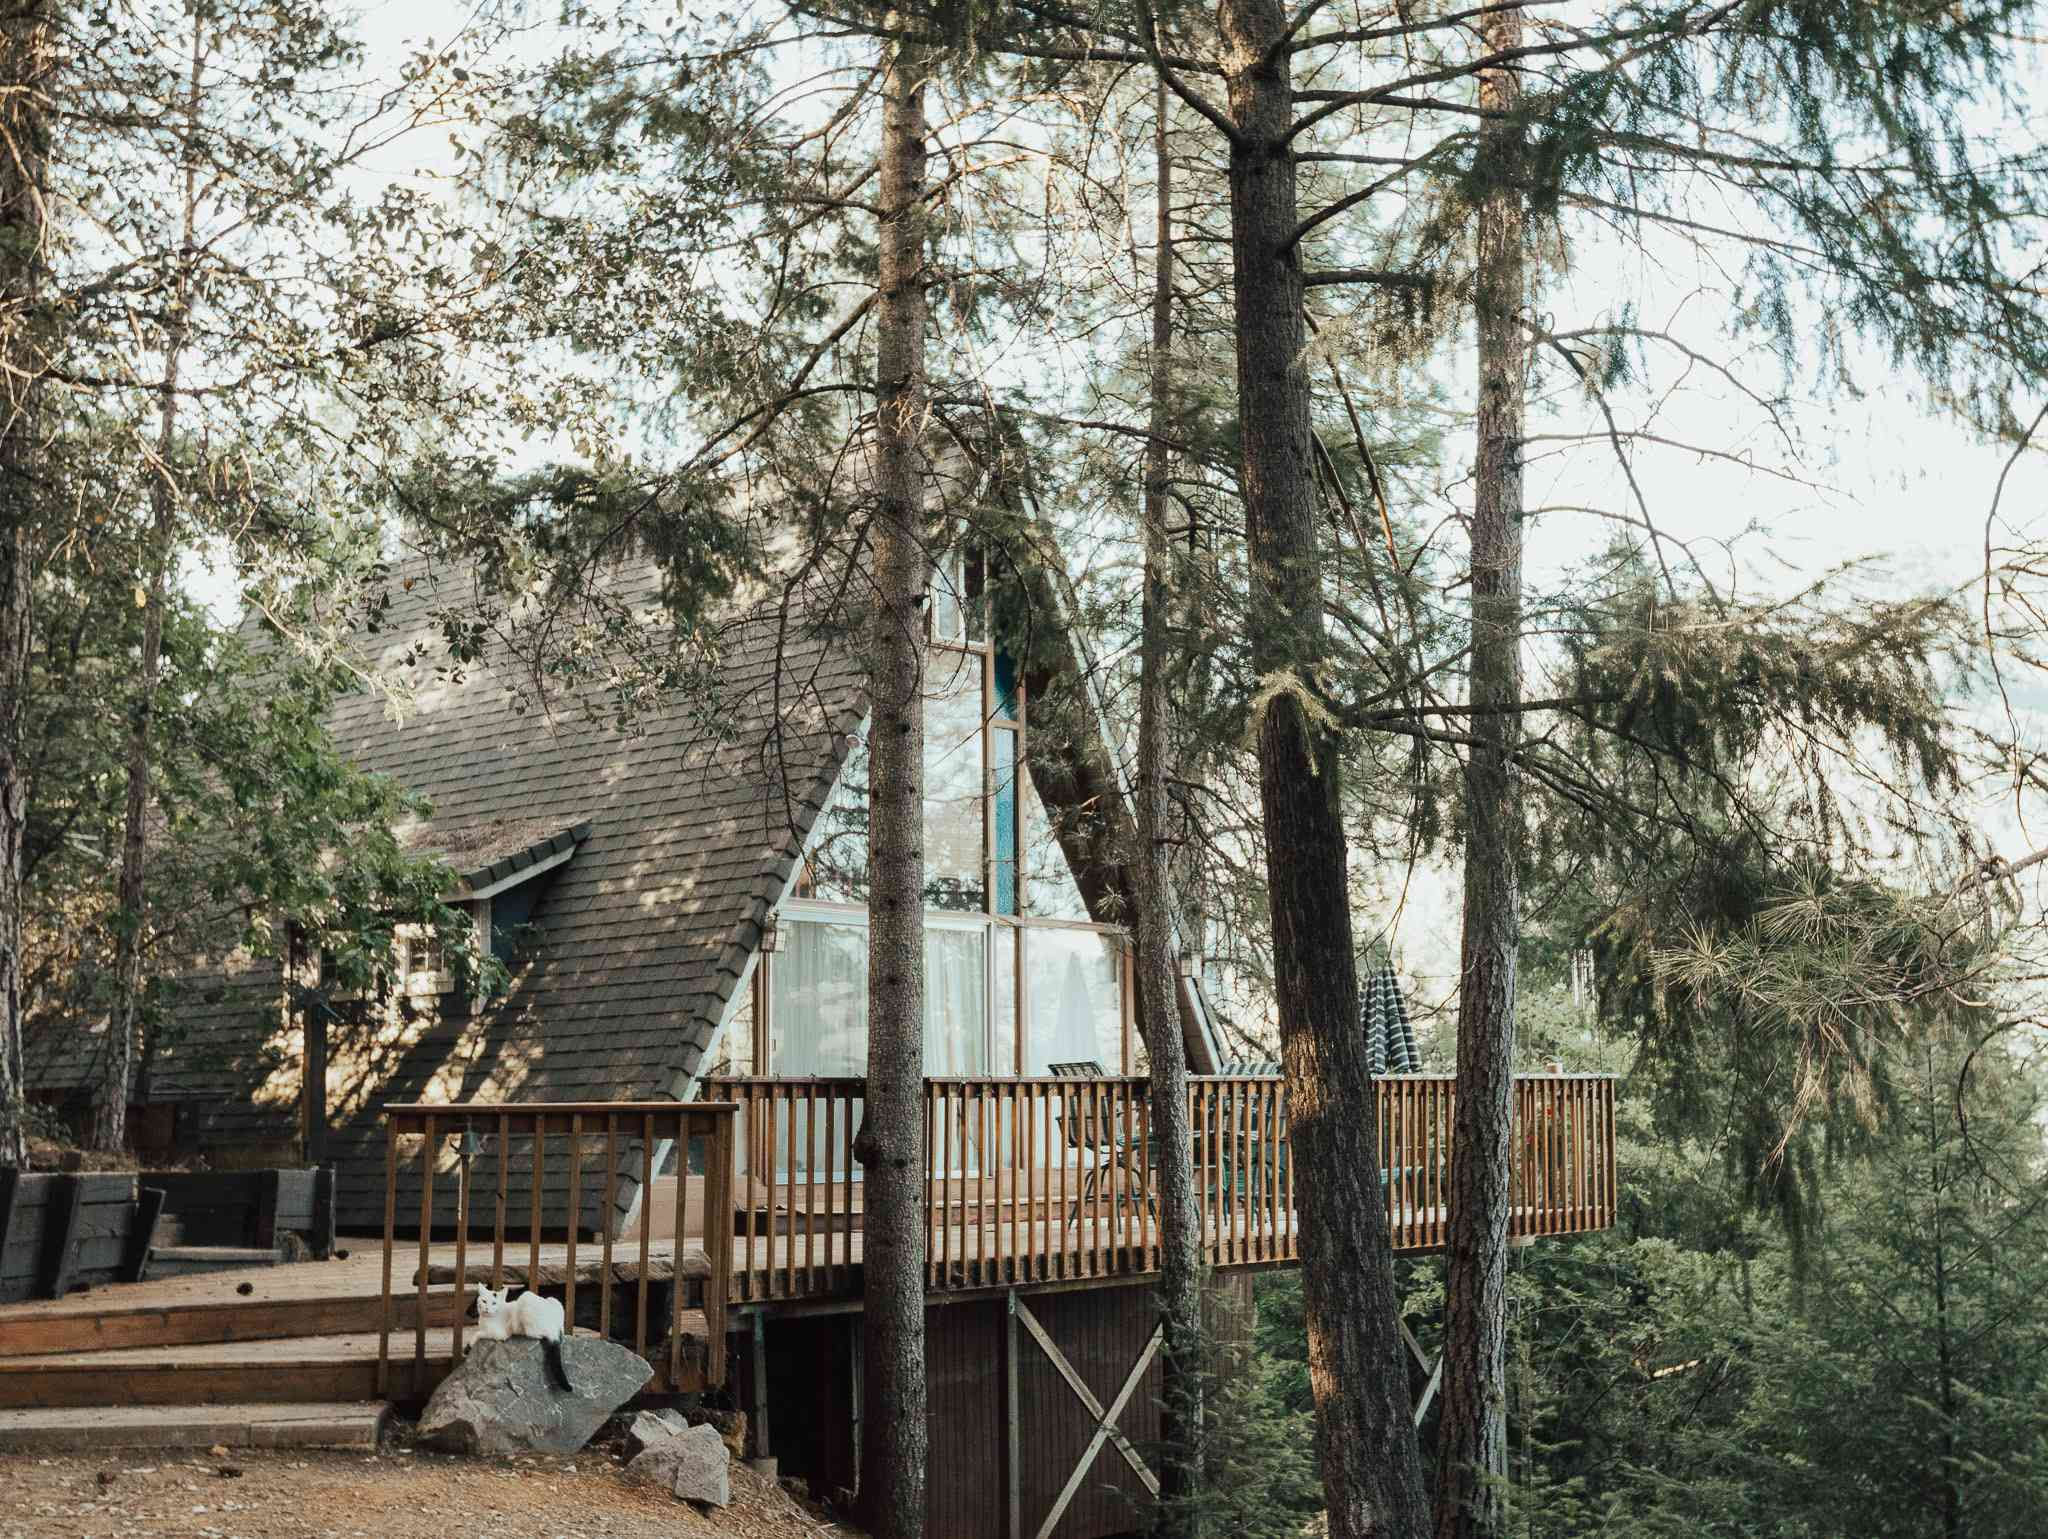 Casa en el árbol A-frame con terraza